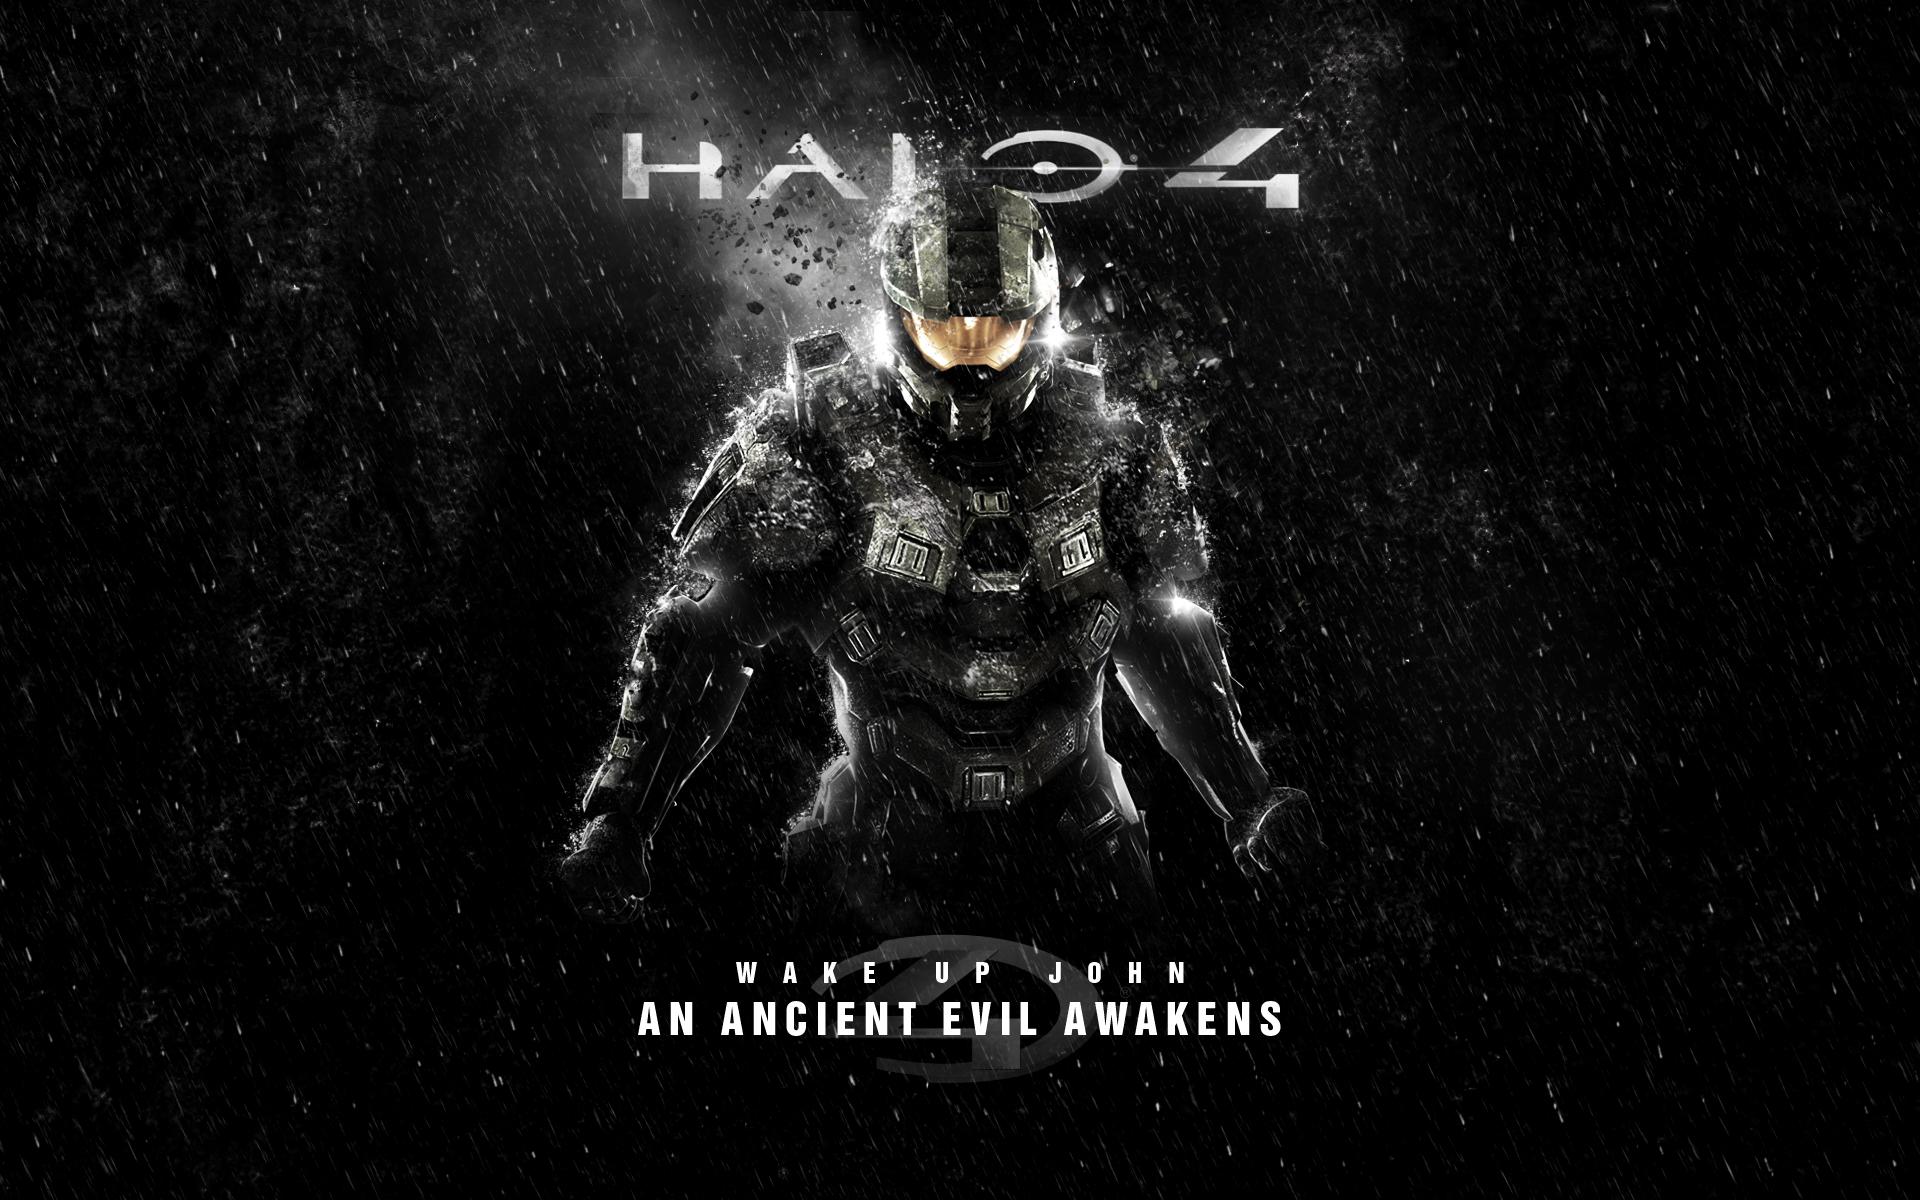 Halo 4 wallpaper 42